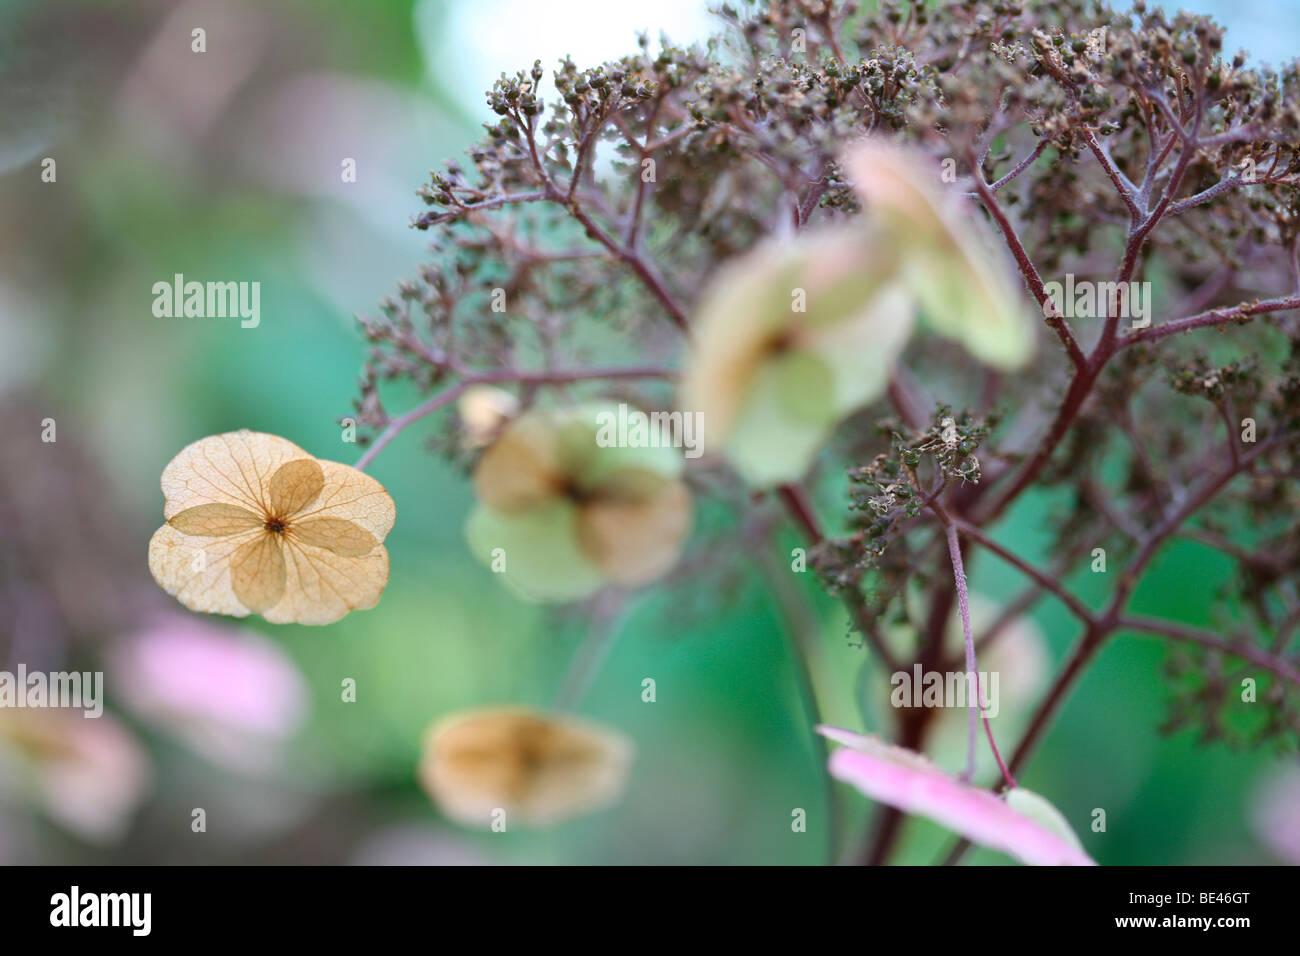 Delightful Flowering Wild Hydrangea Sargentiana Rustic Plant-fine art photography Jane-Ann Butler Photography JABP609 - Stock Image